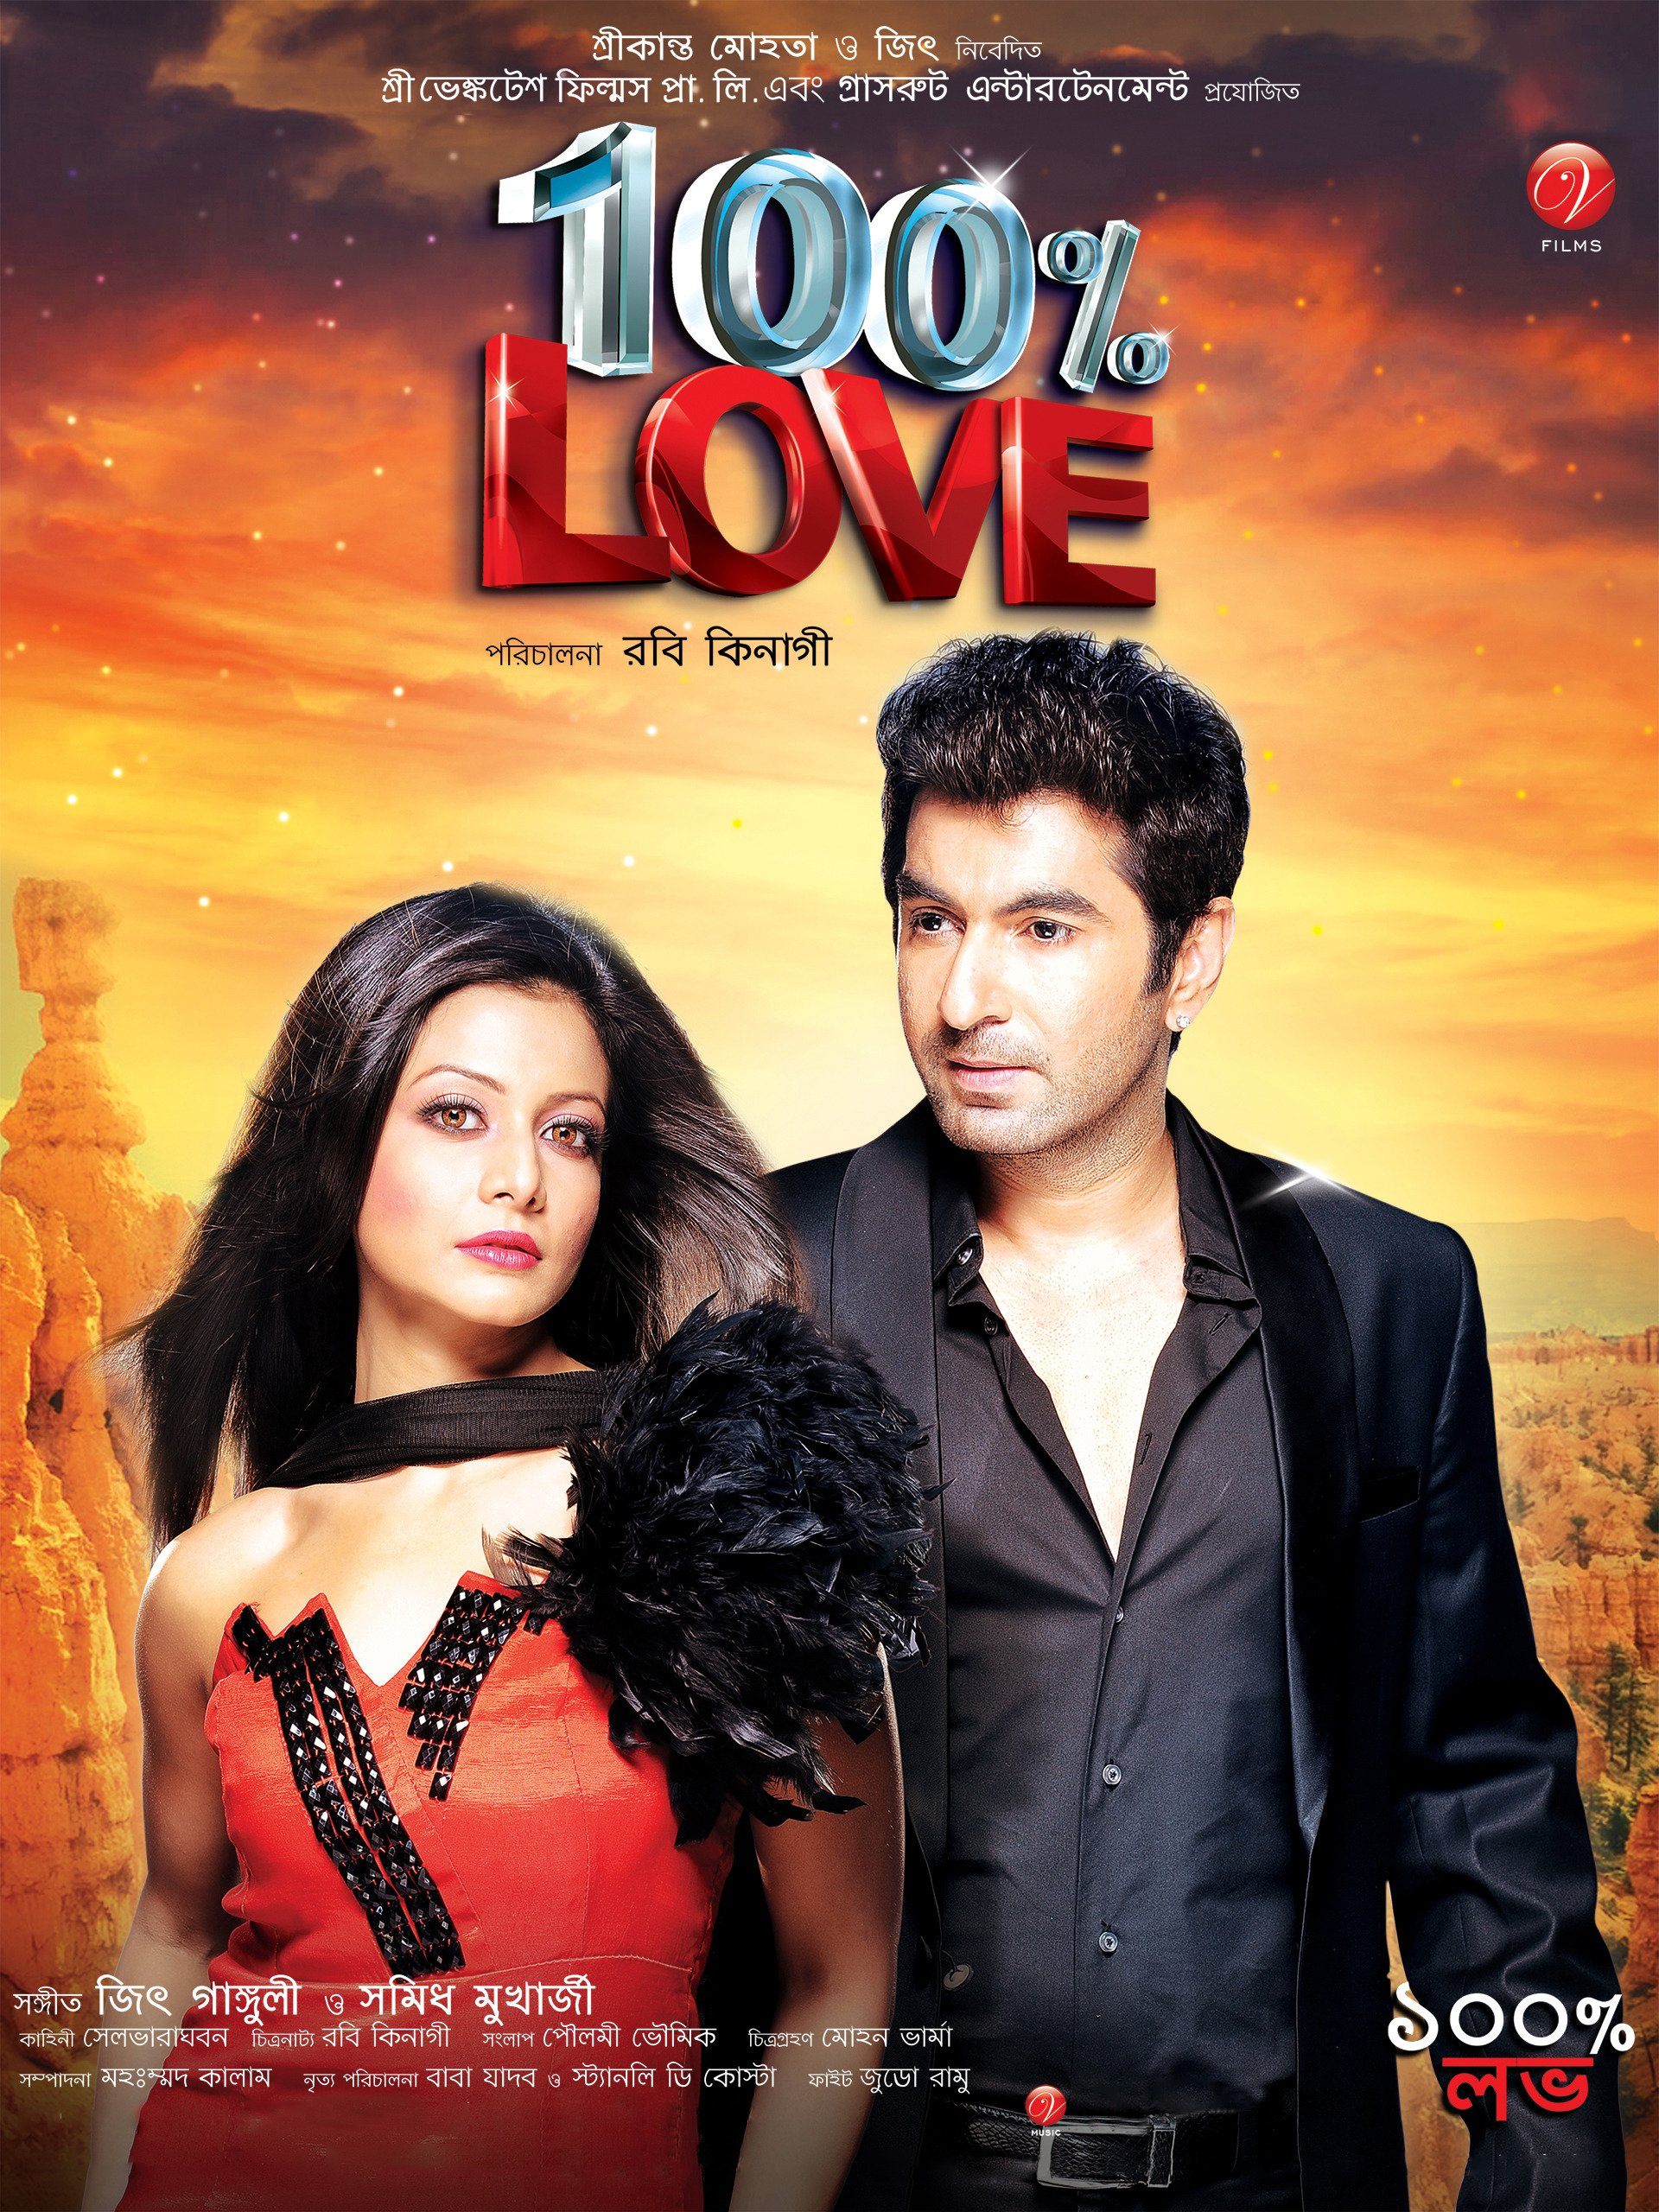 100 love bengali full movie watch online free